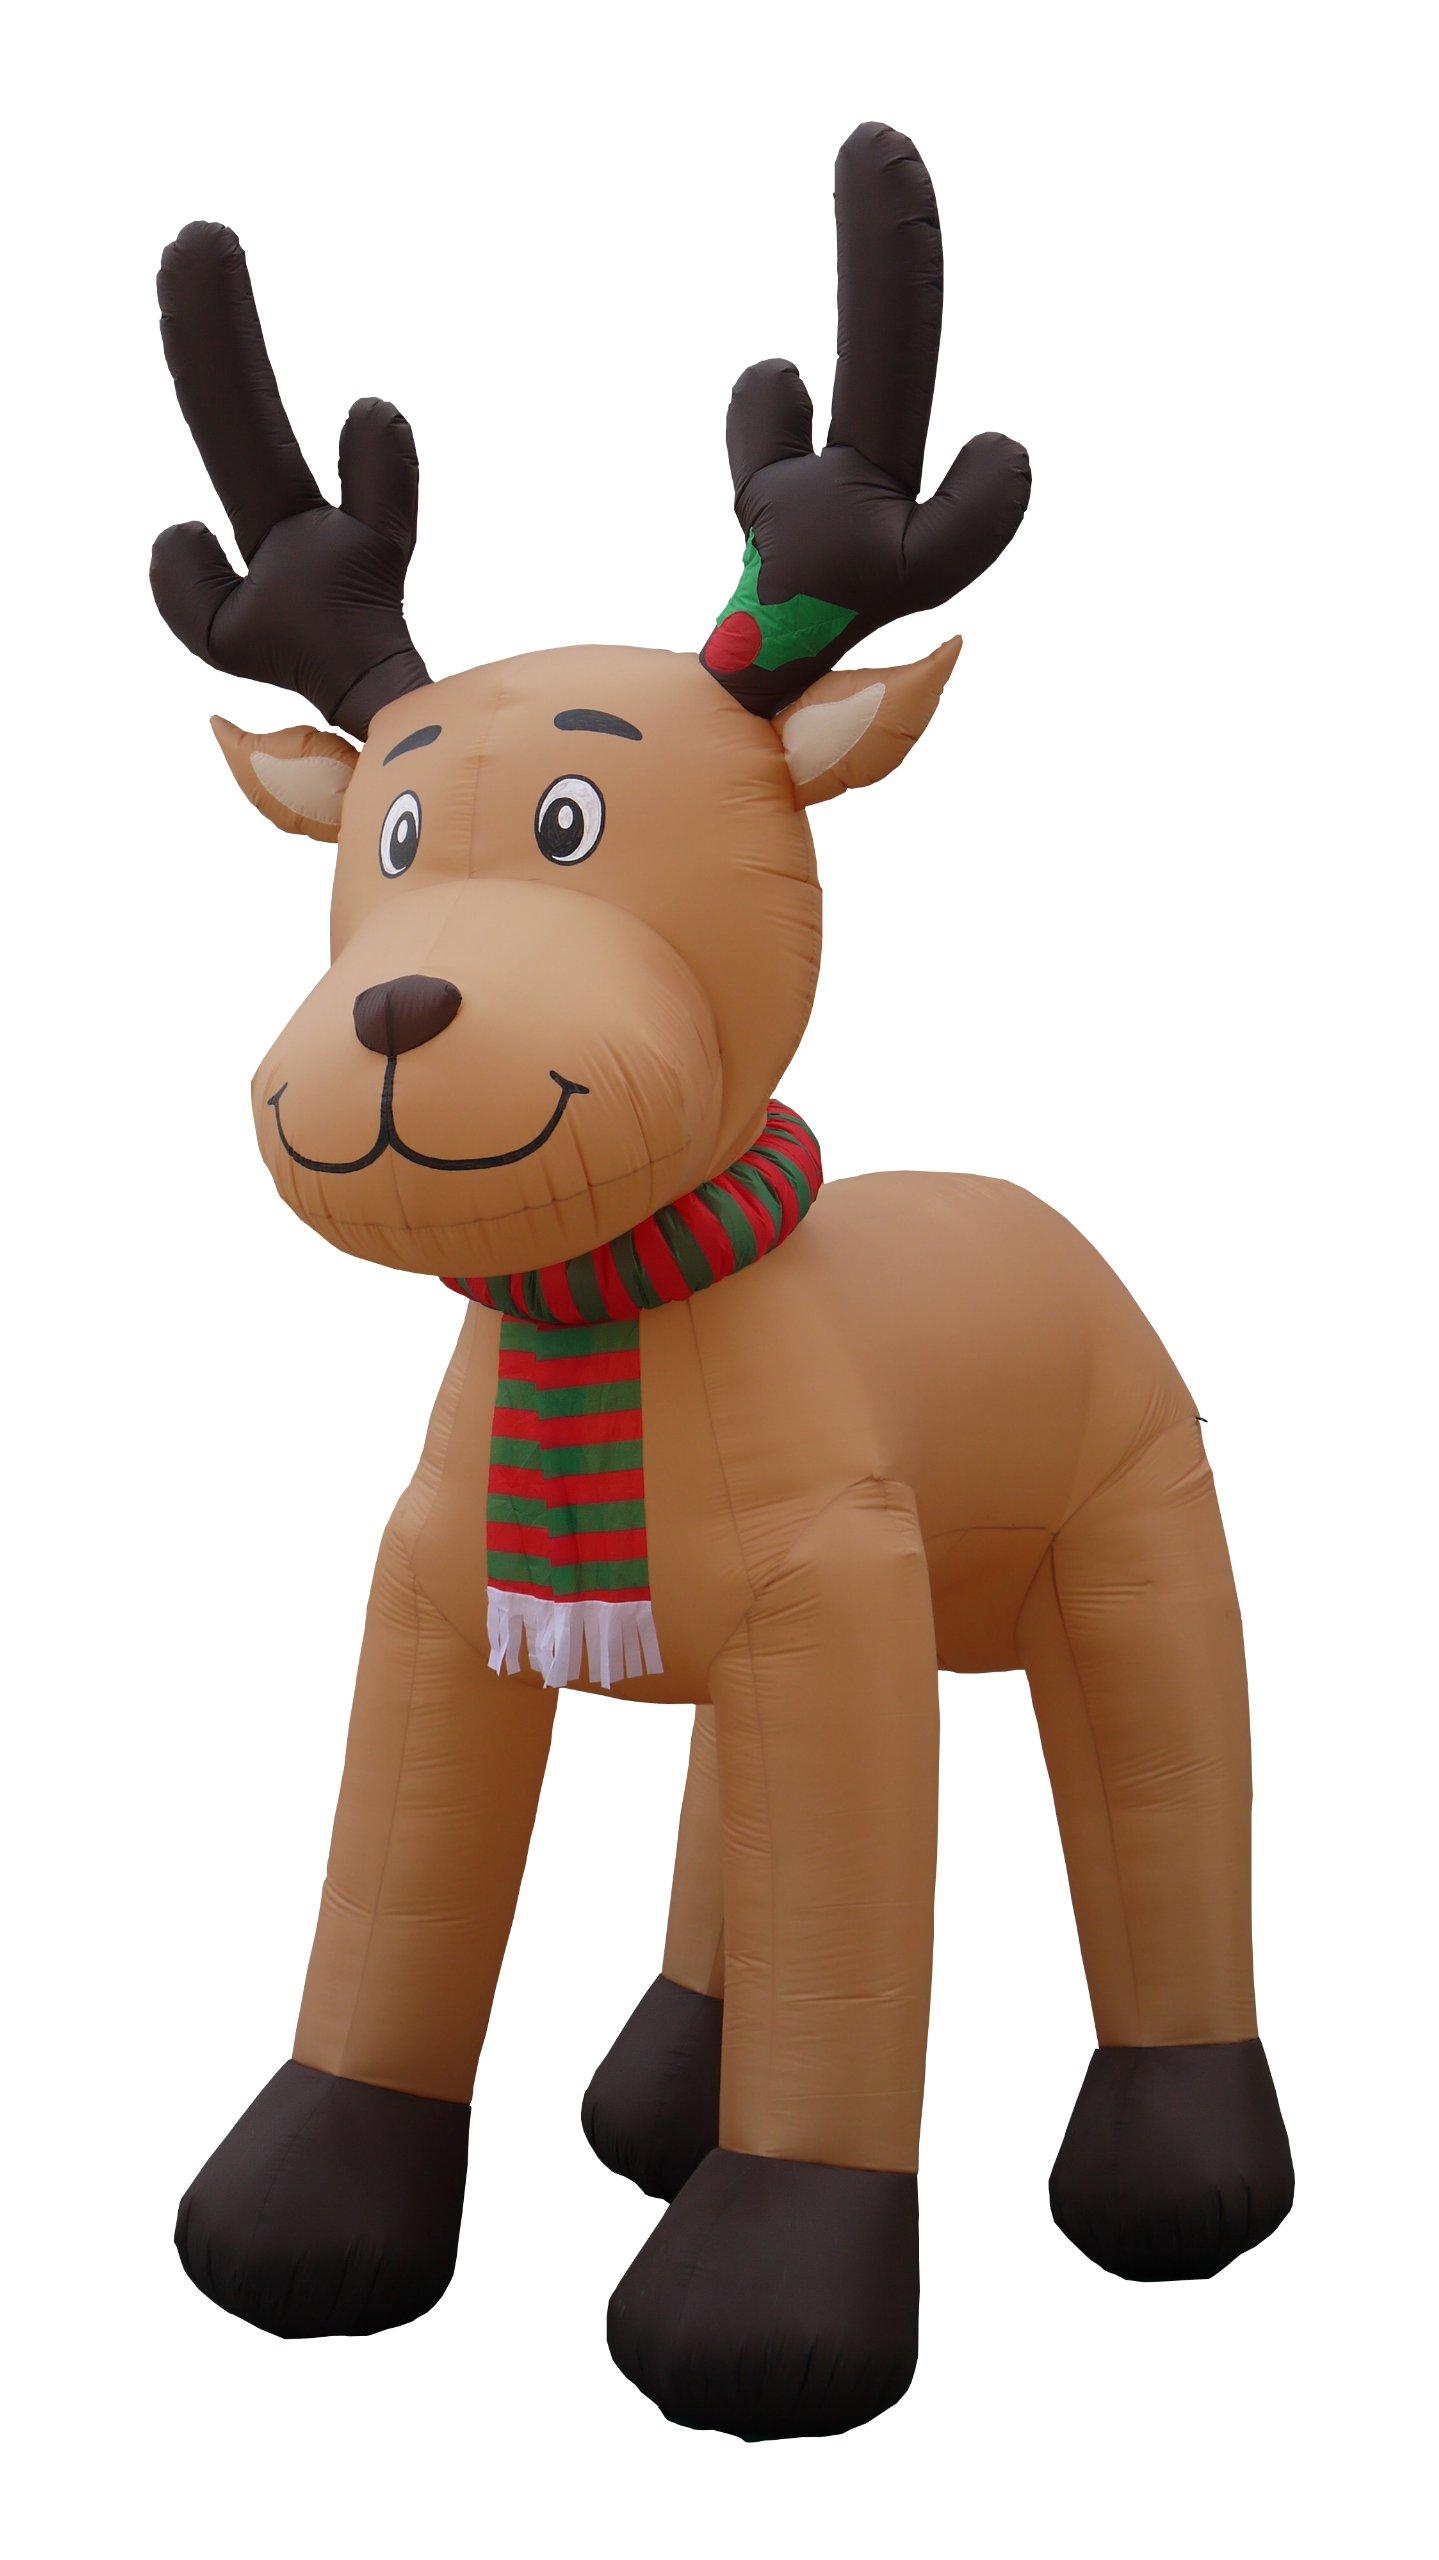 JUMBO 15 Foot Christmas Inflatable Reindeer Decoration